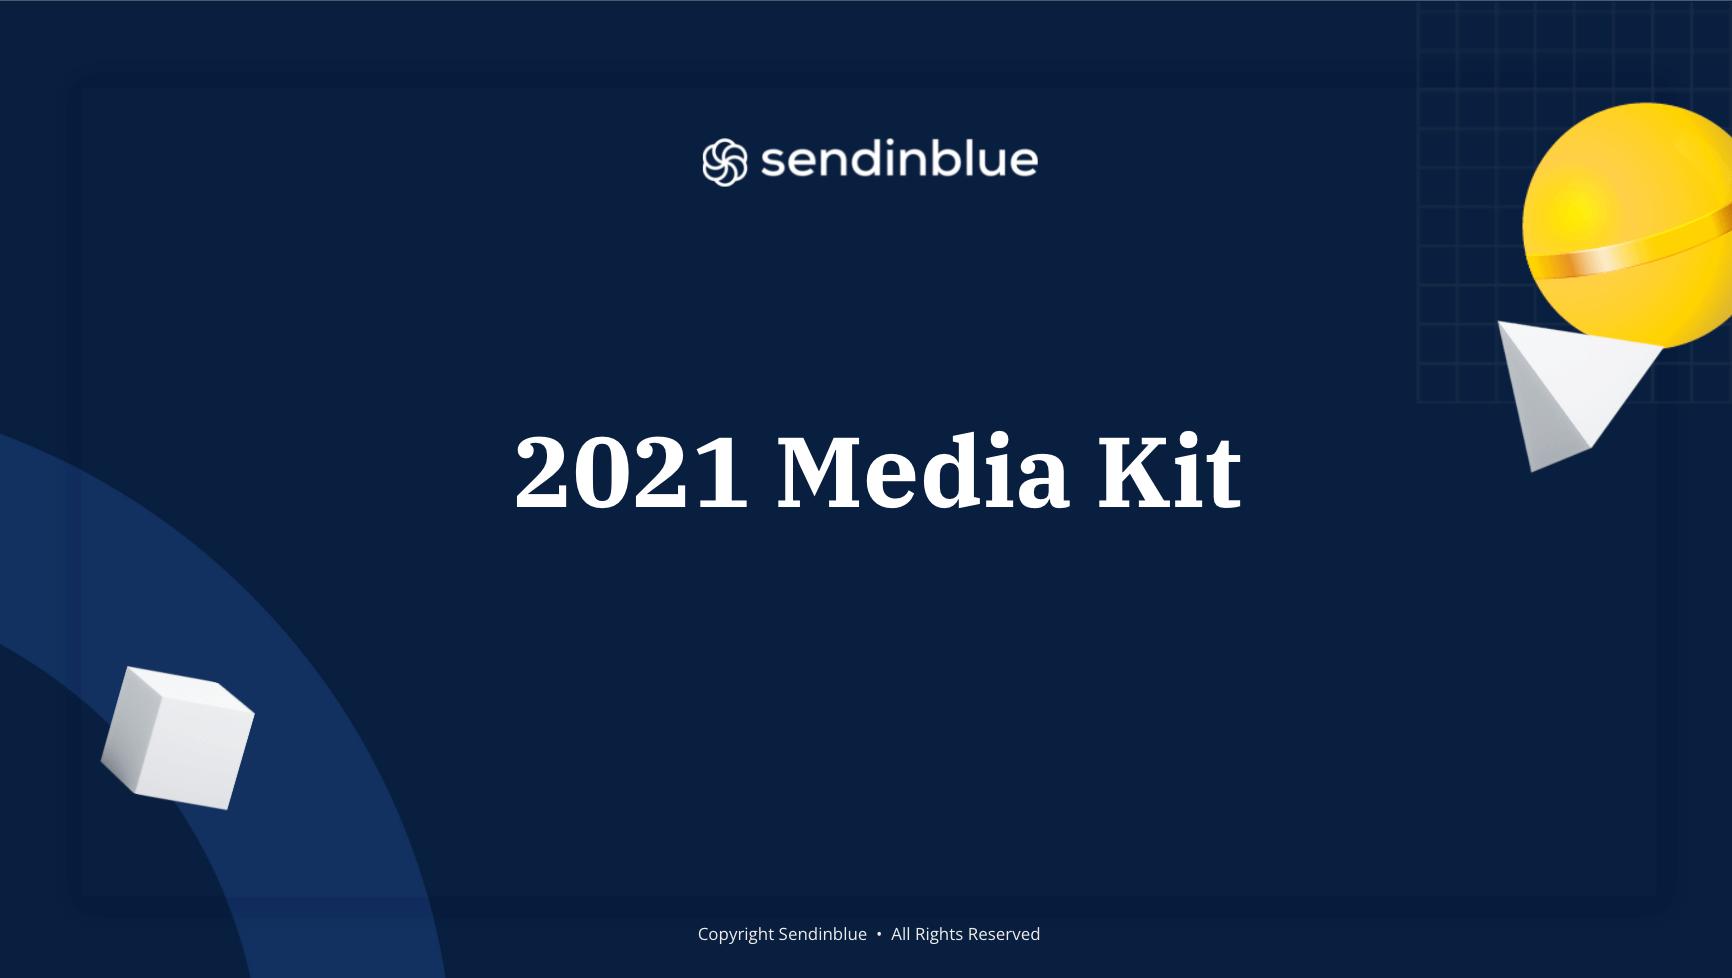 SendinBlue Mediakit 2021